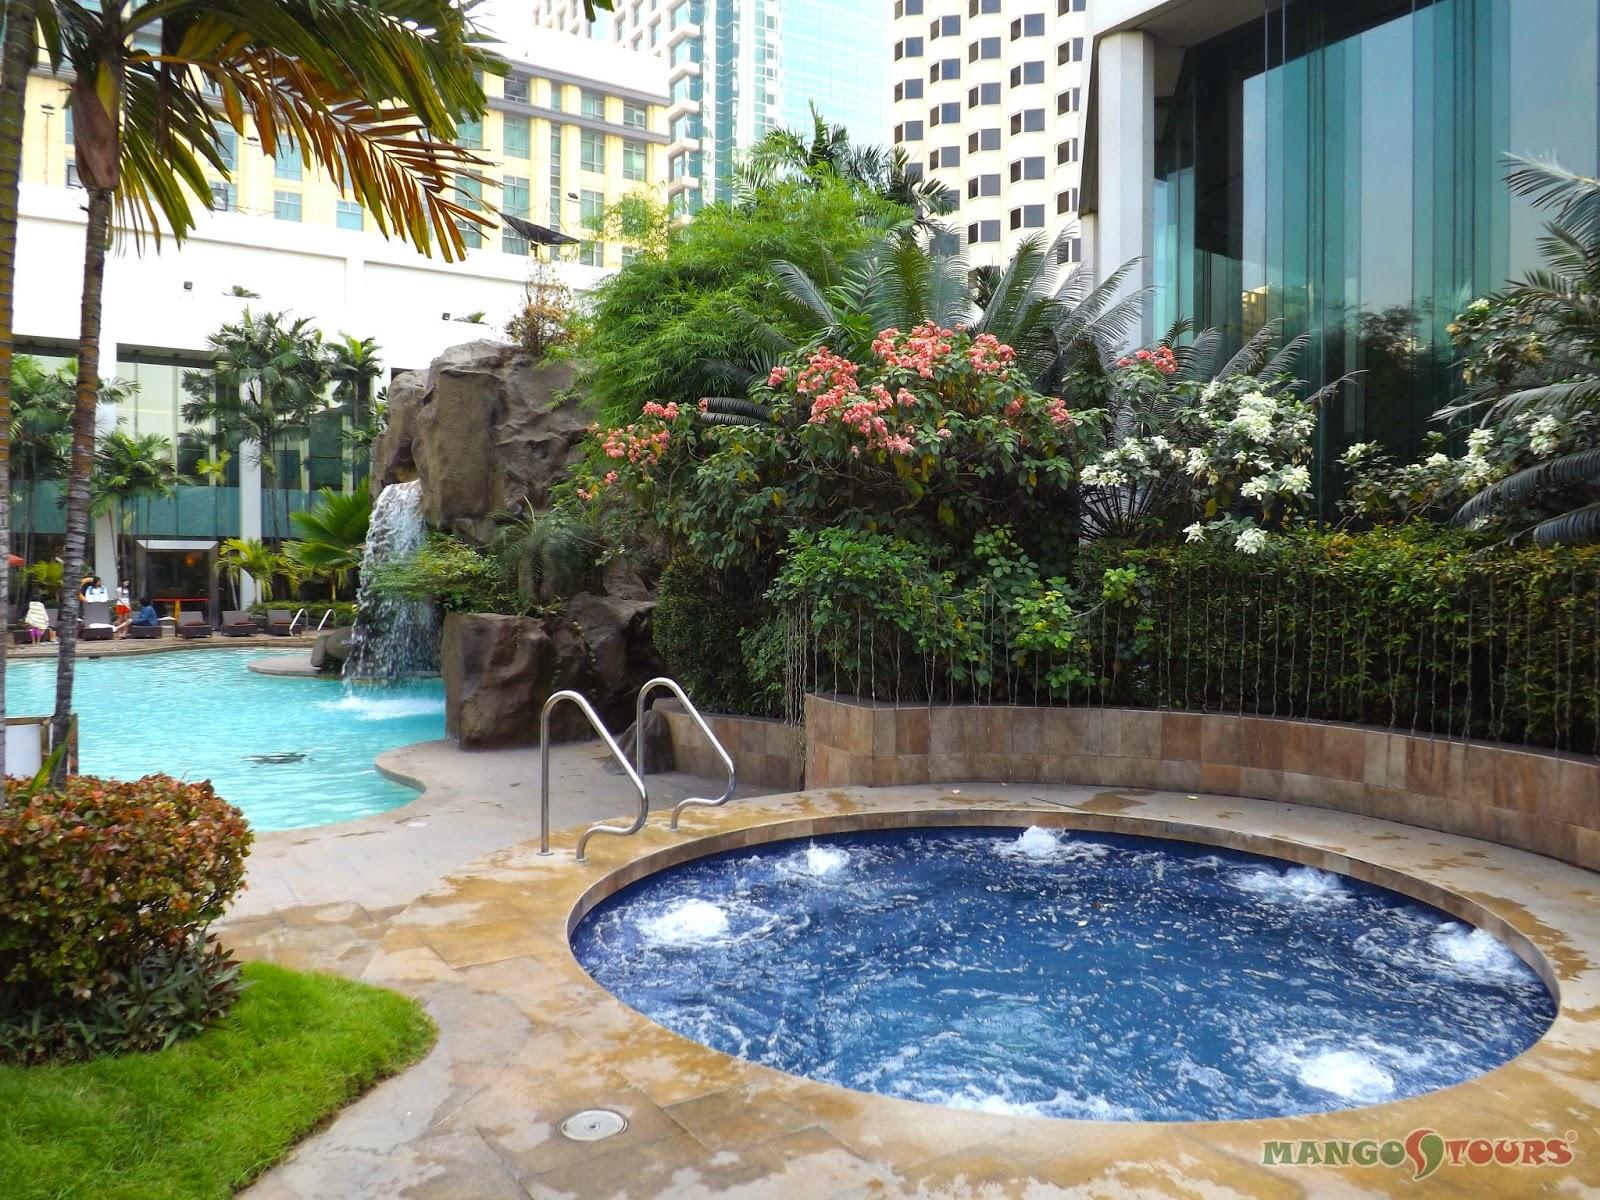 Mango Tours Diamond Hotel Philippines Swimming Pool